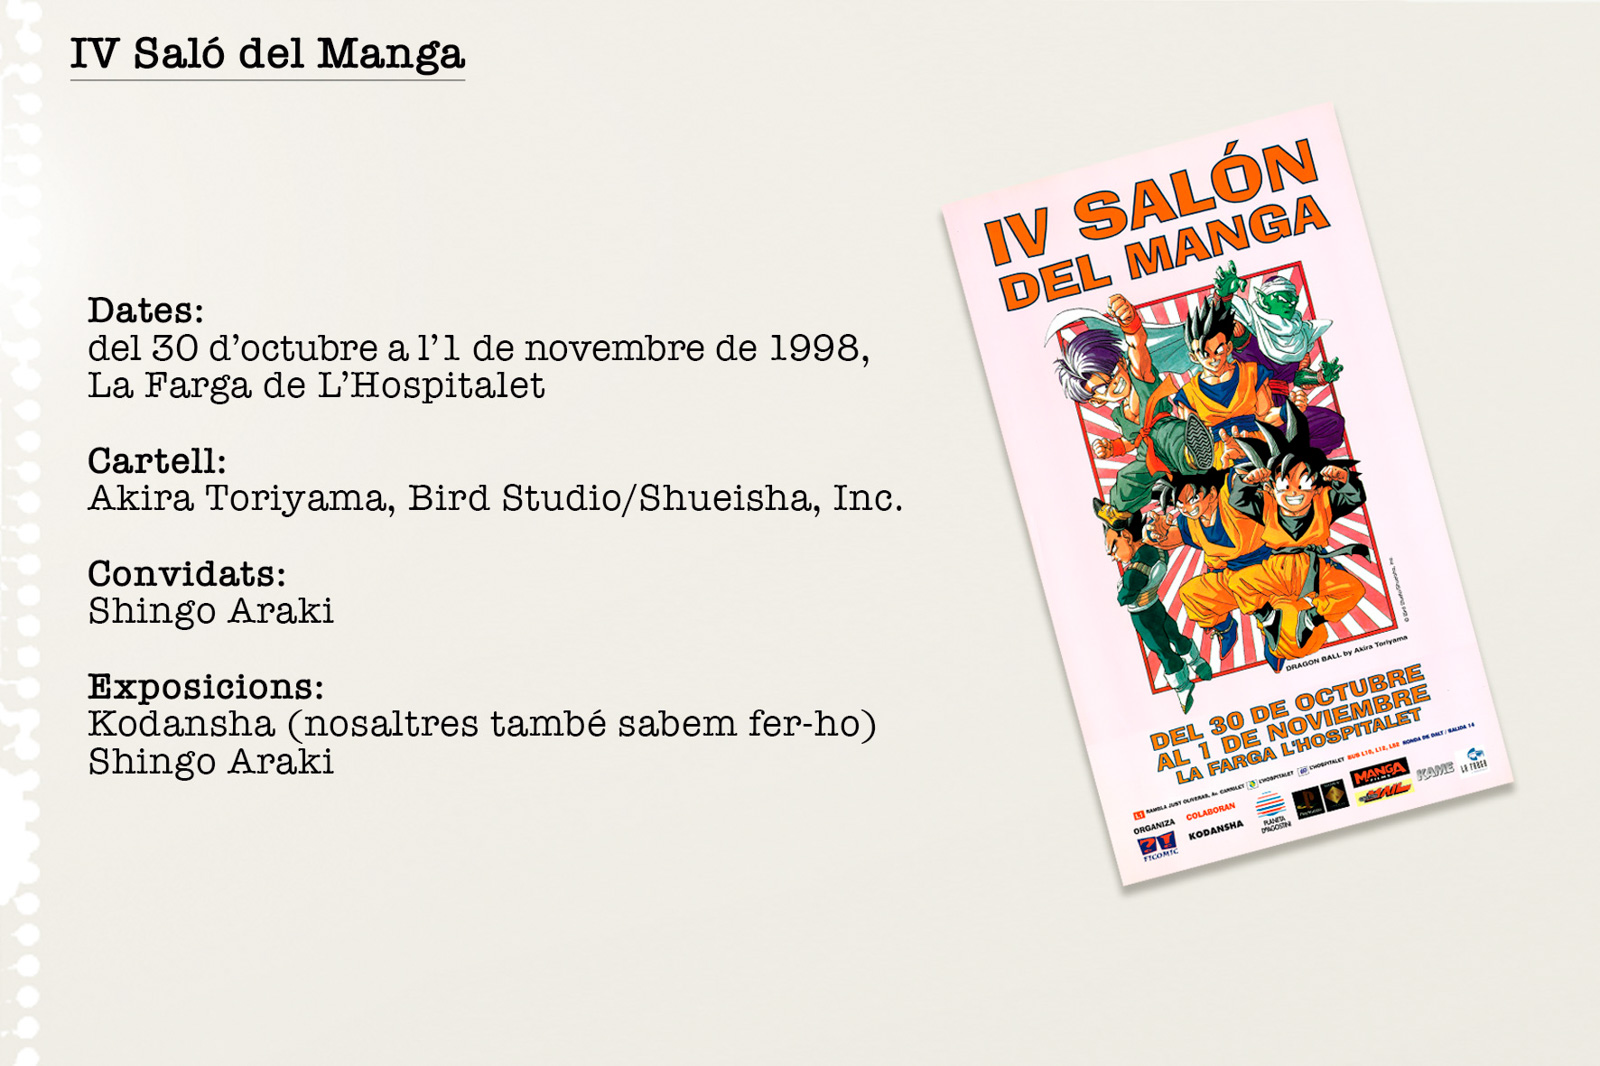 IV - Akira Toriyama, Bird Studio/Shueisha, Inc.